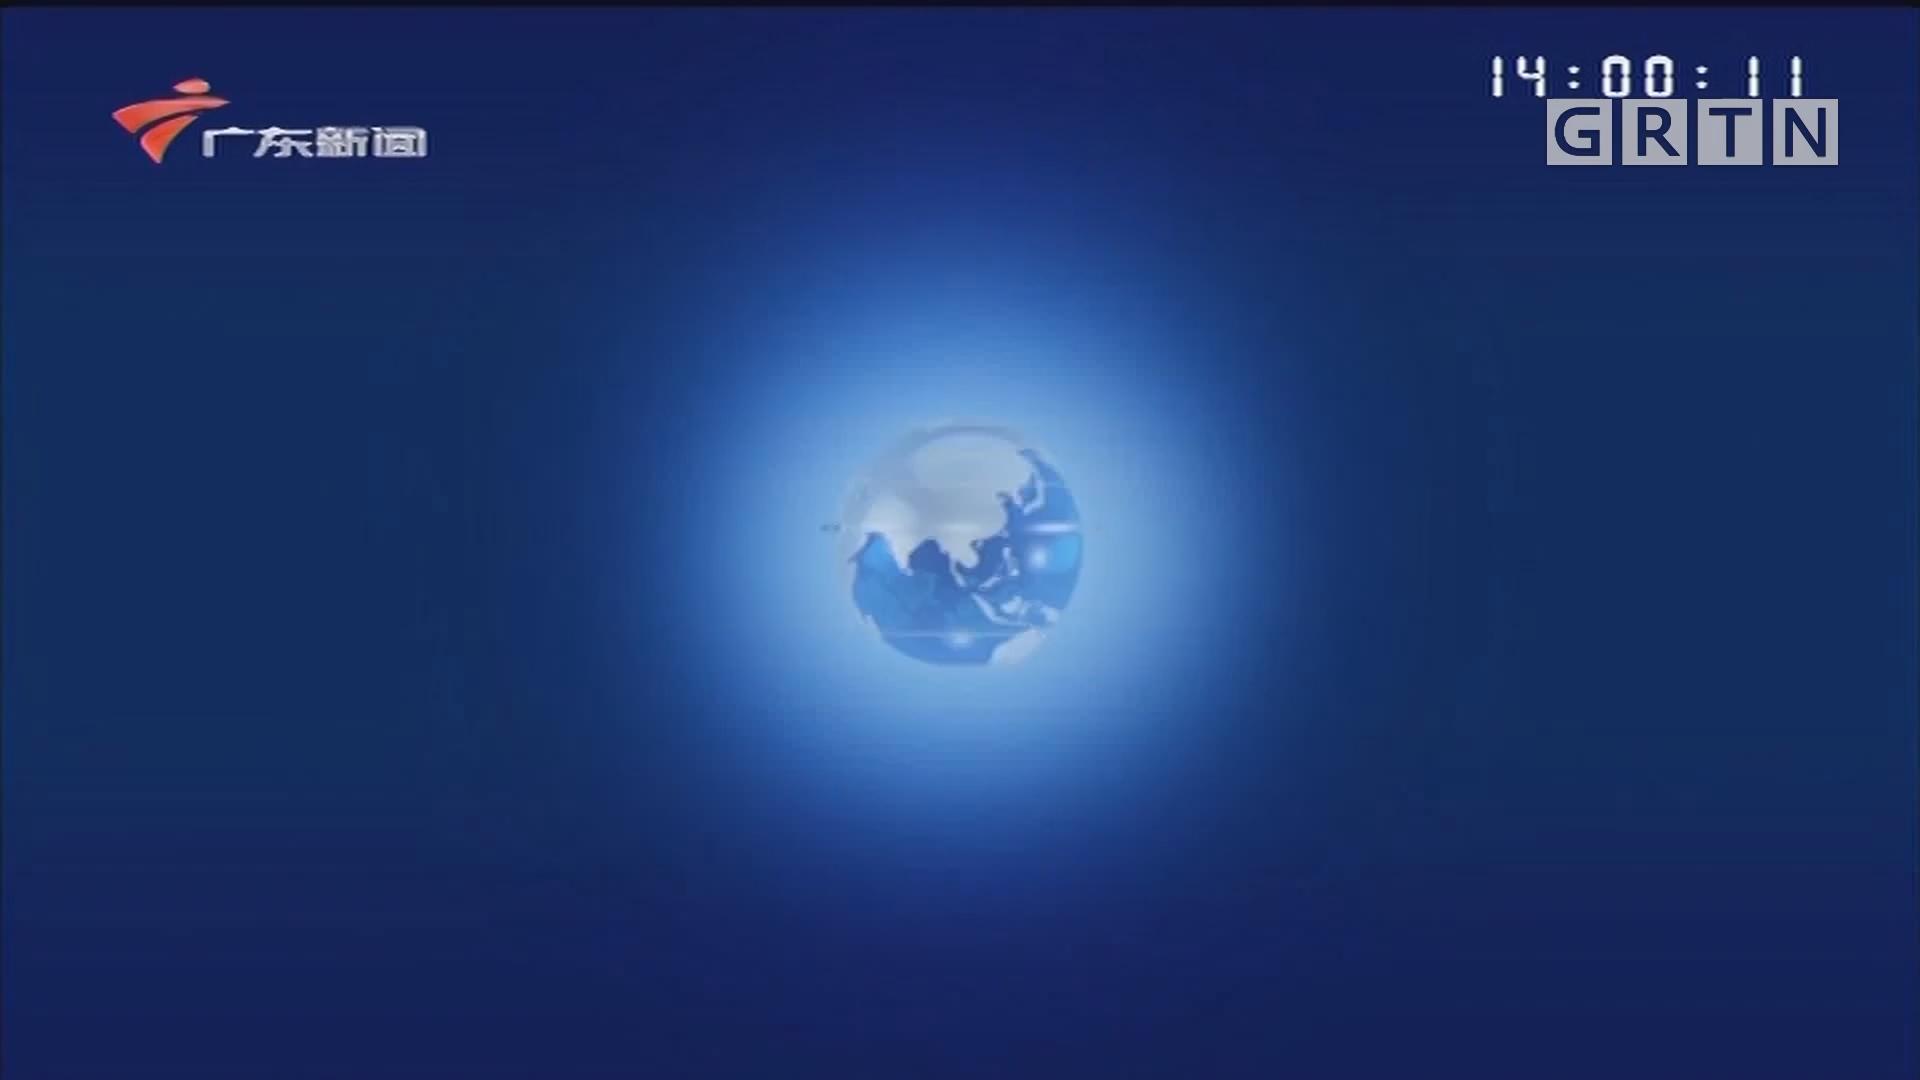 [HD][2020-05-22-14:00]正點播報:十三屆全國人大三次會議主席團舉行第一次會議